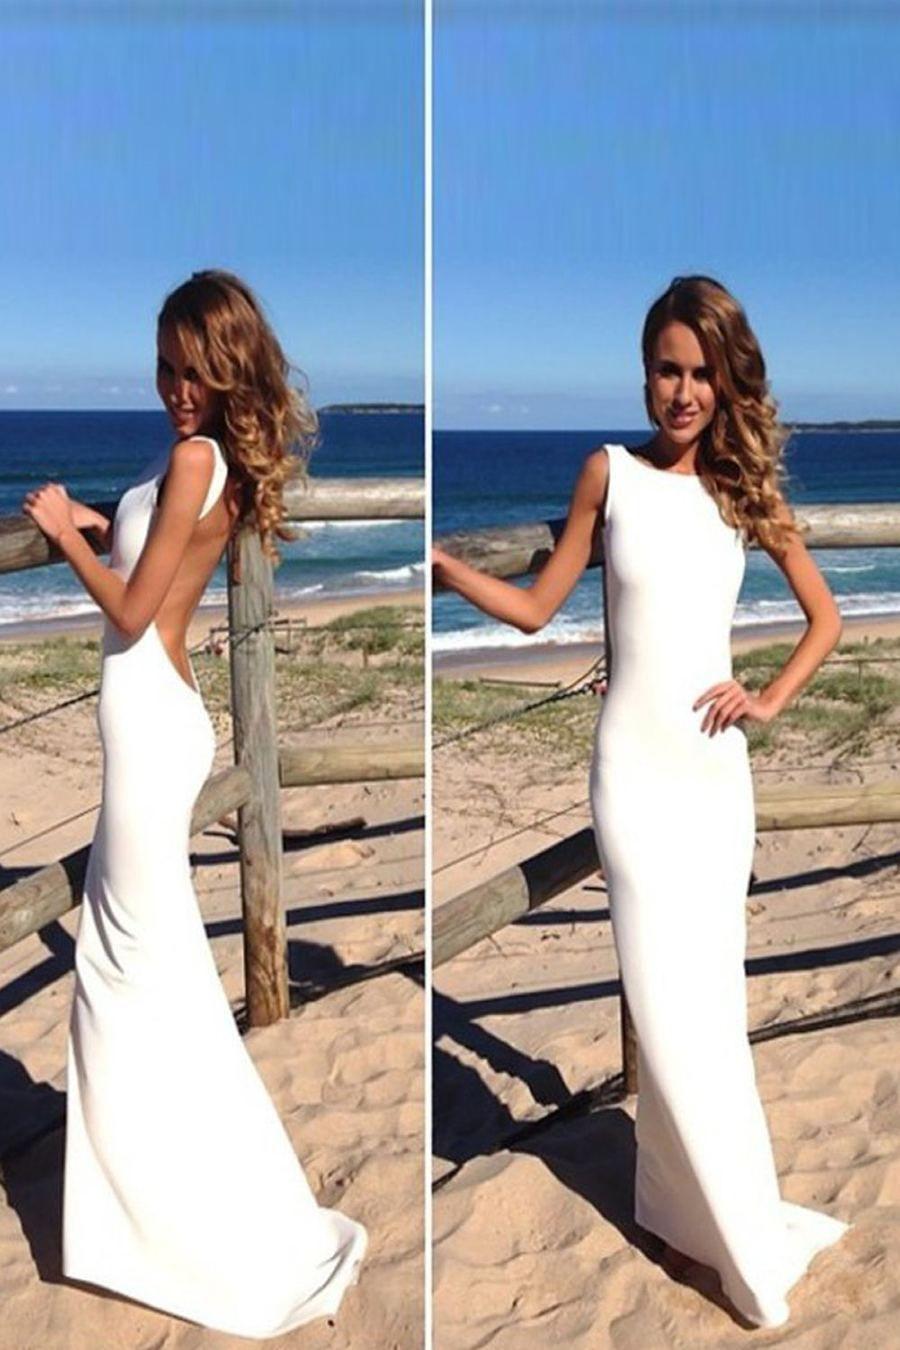 Ivory beach wedding dresses  Open Back Mermaid White Long Elegant Prom DressesBeach Wedding